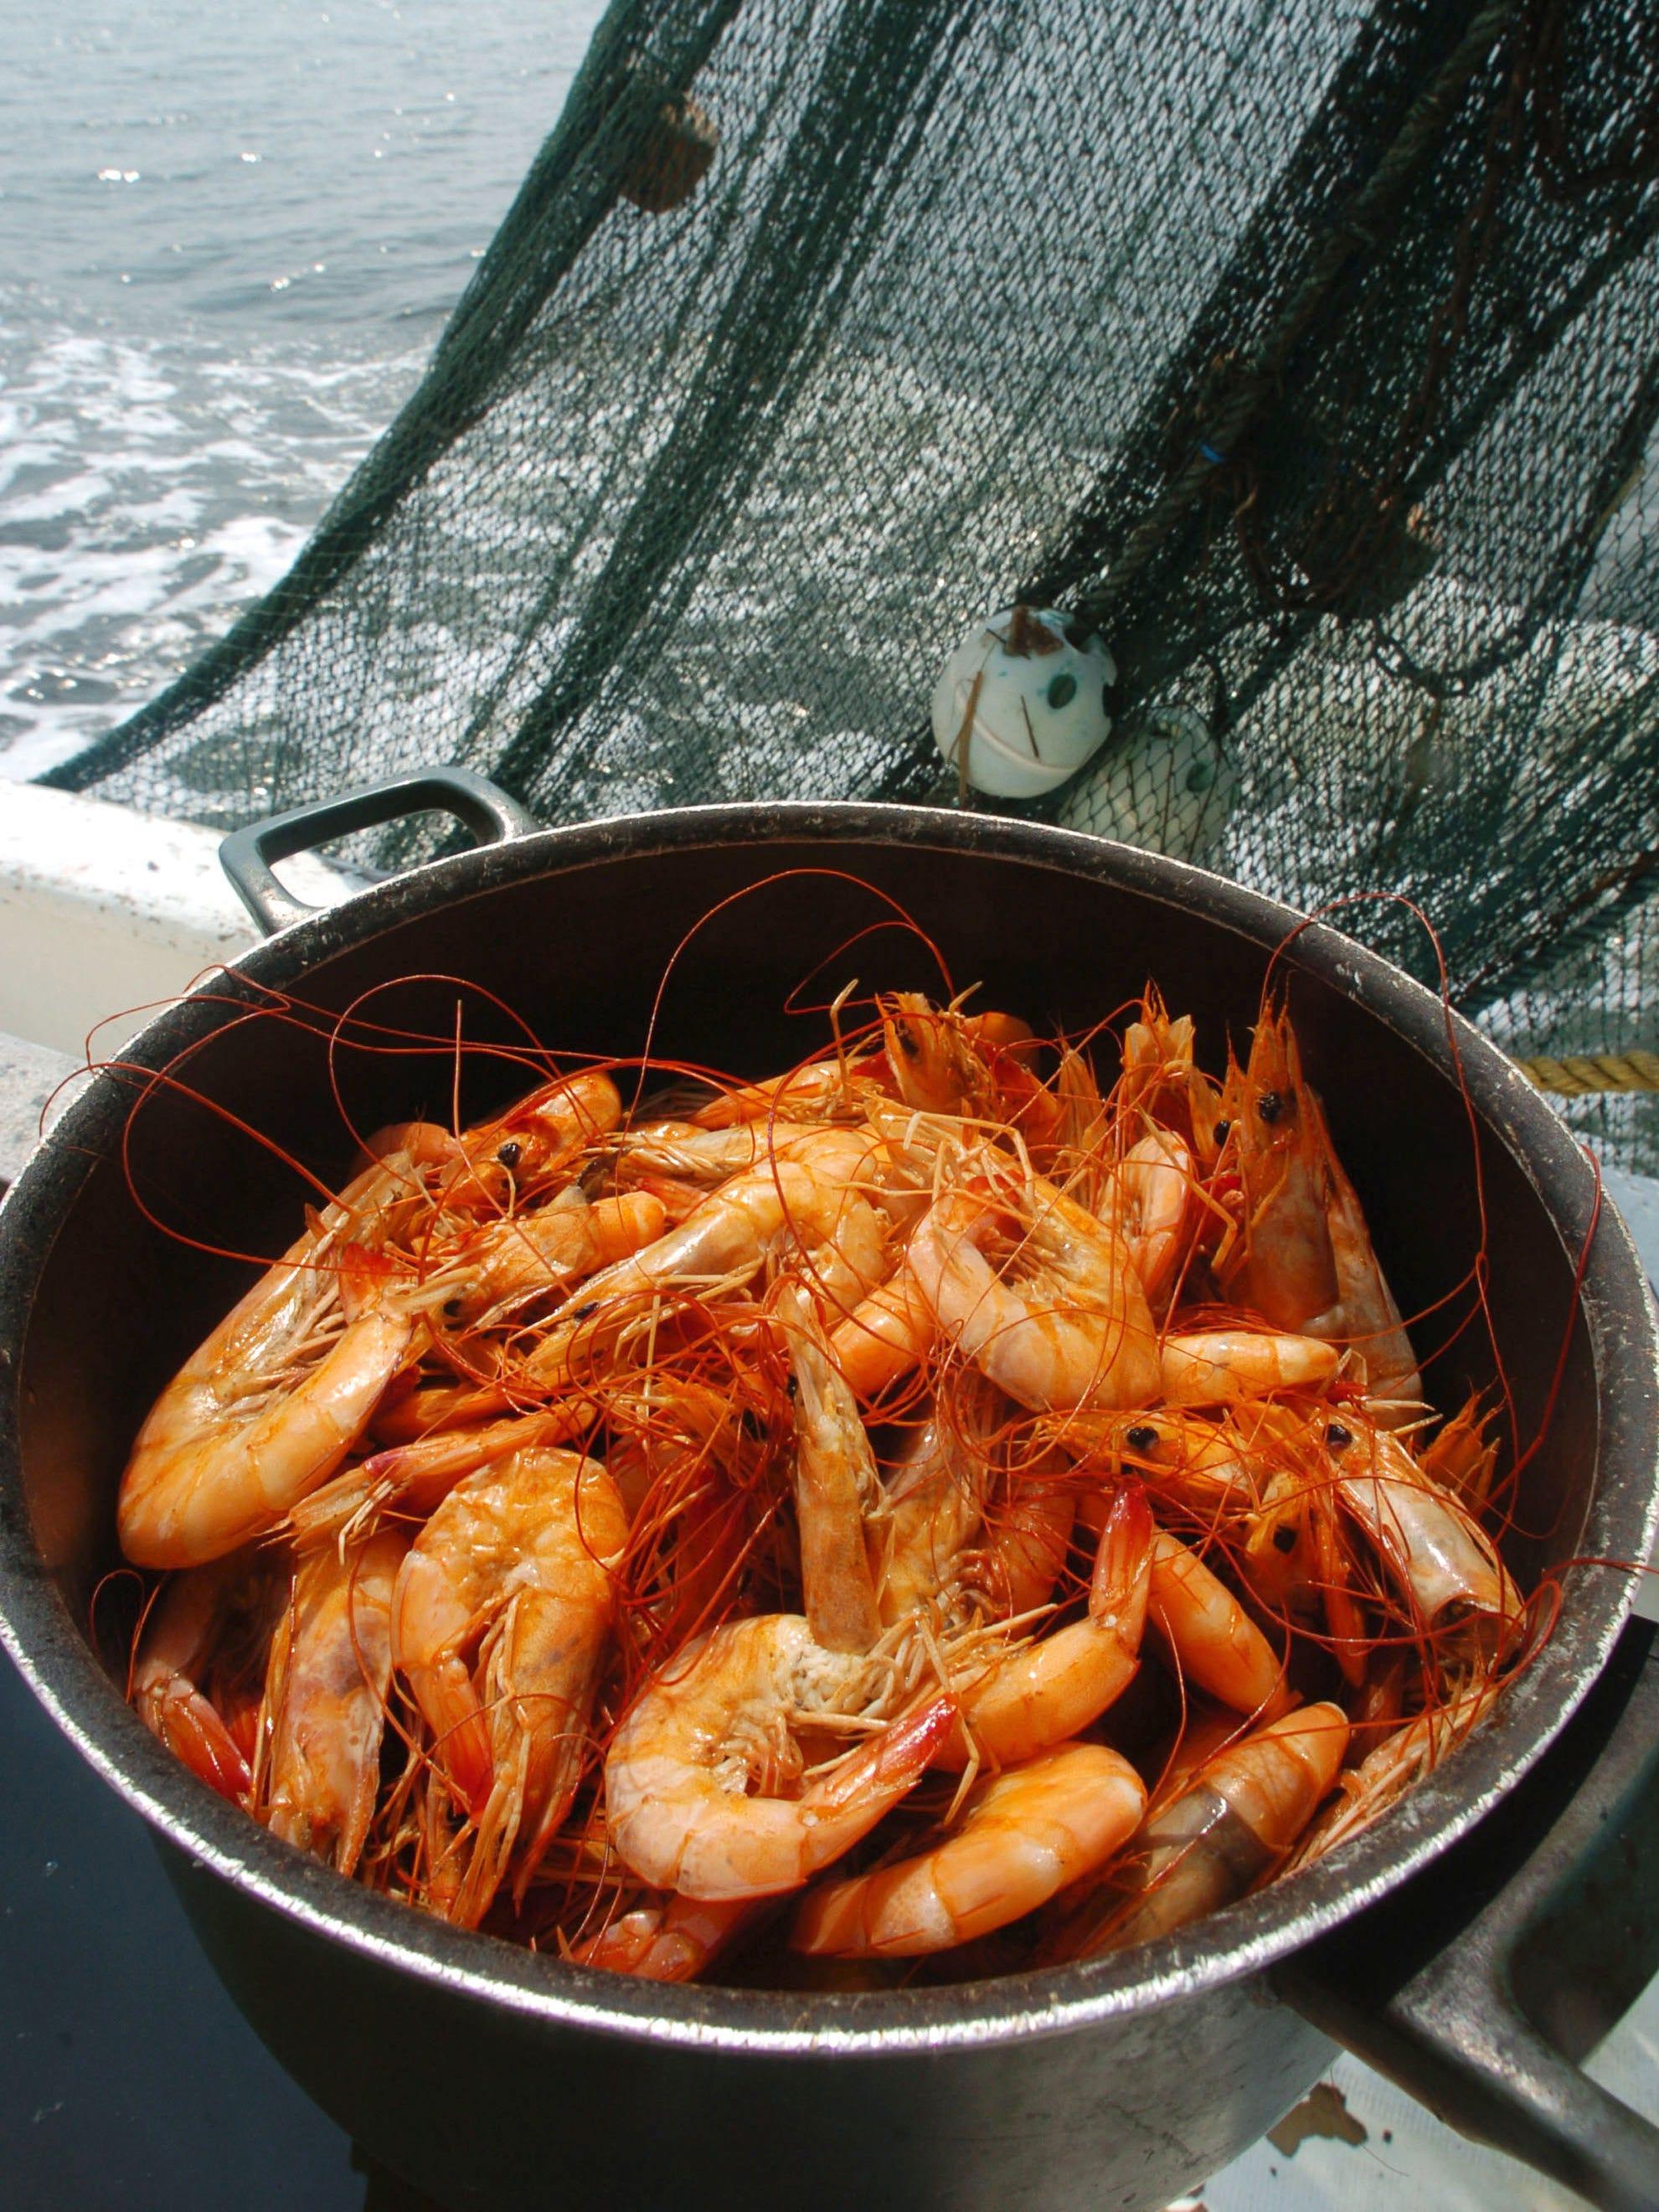 FRESH SHRIMP DECAL sticker local caught shrimper cold steamed pound